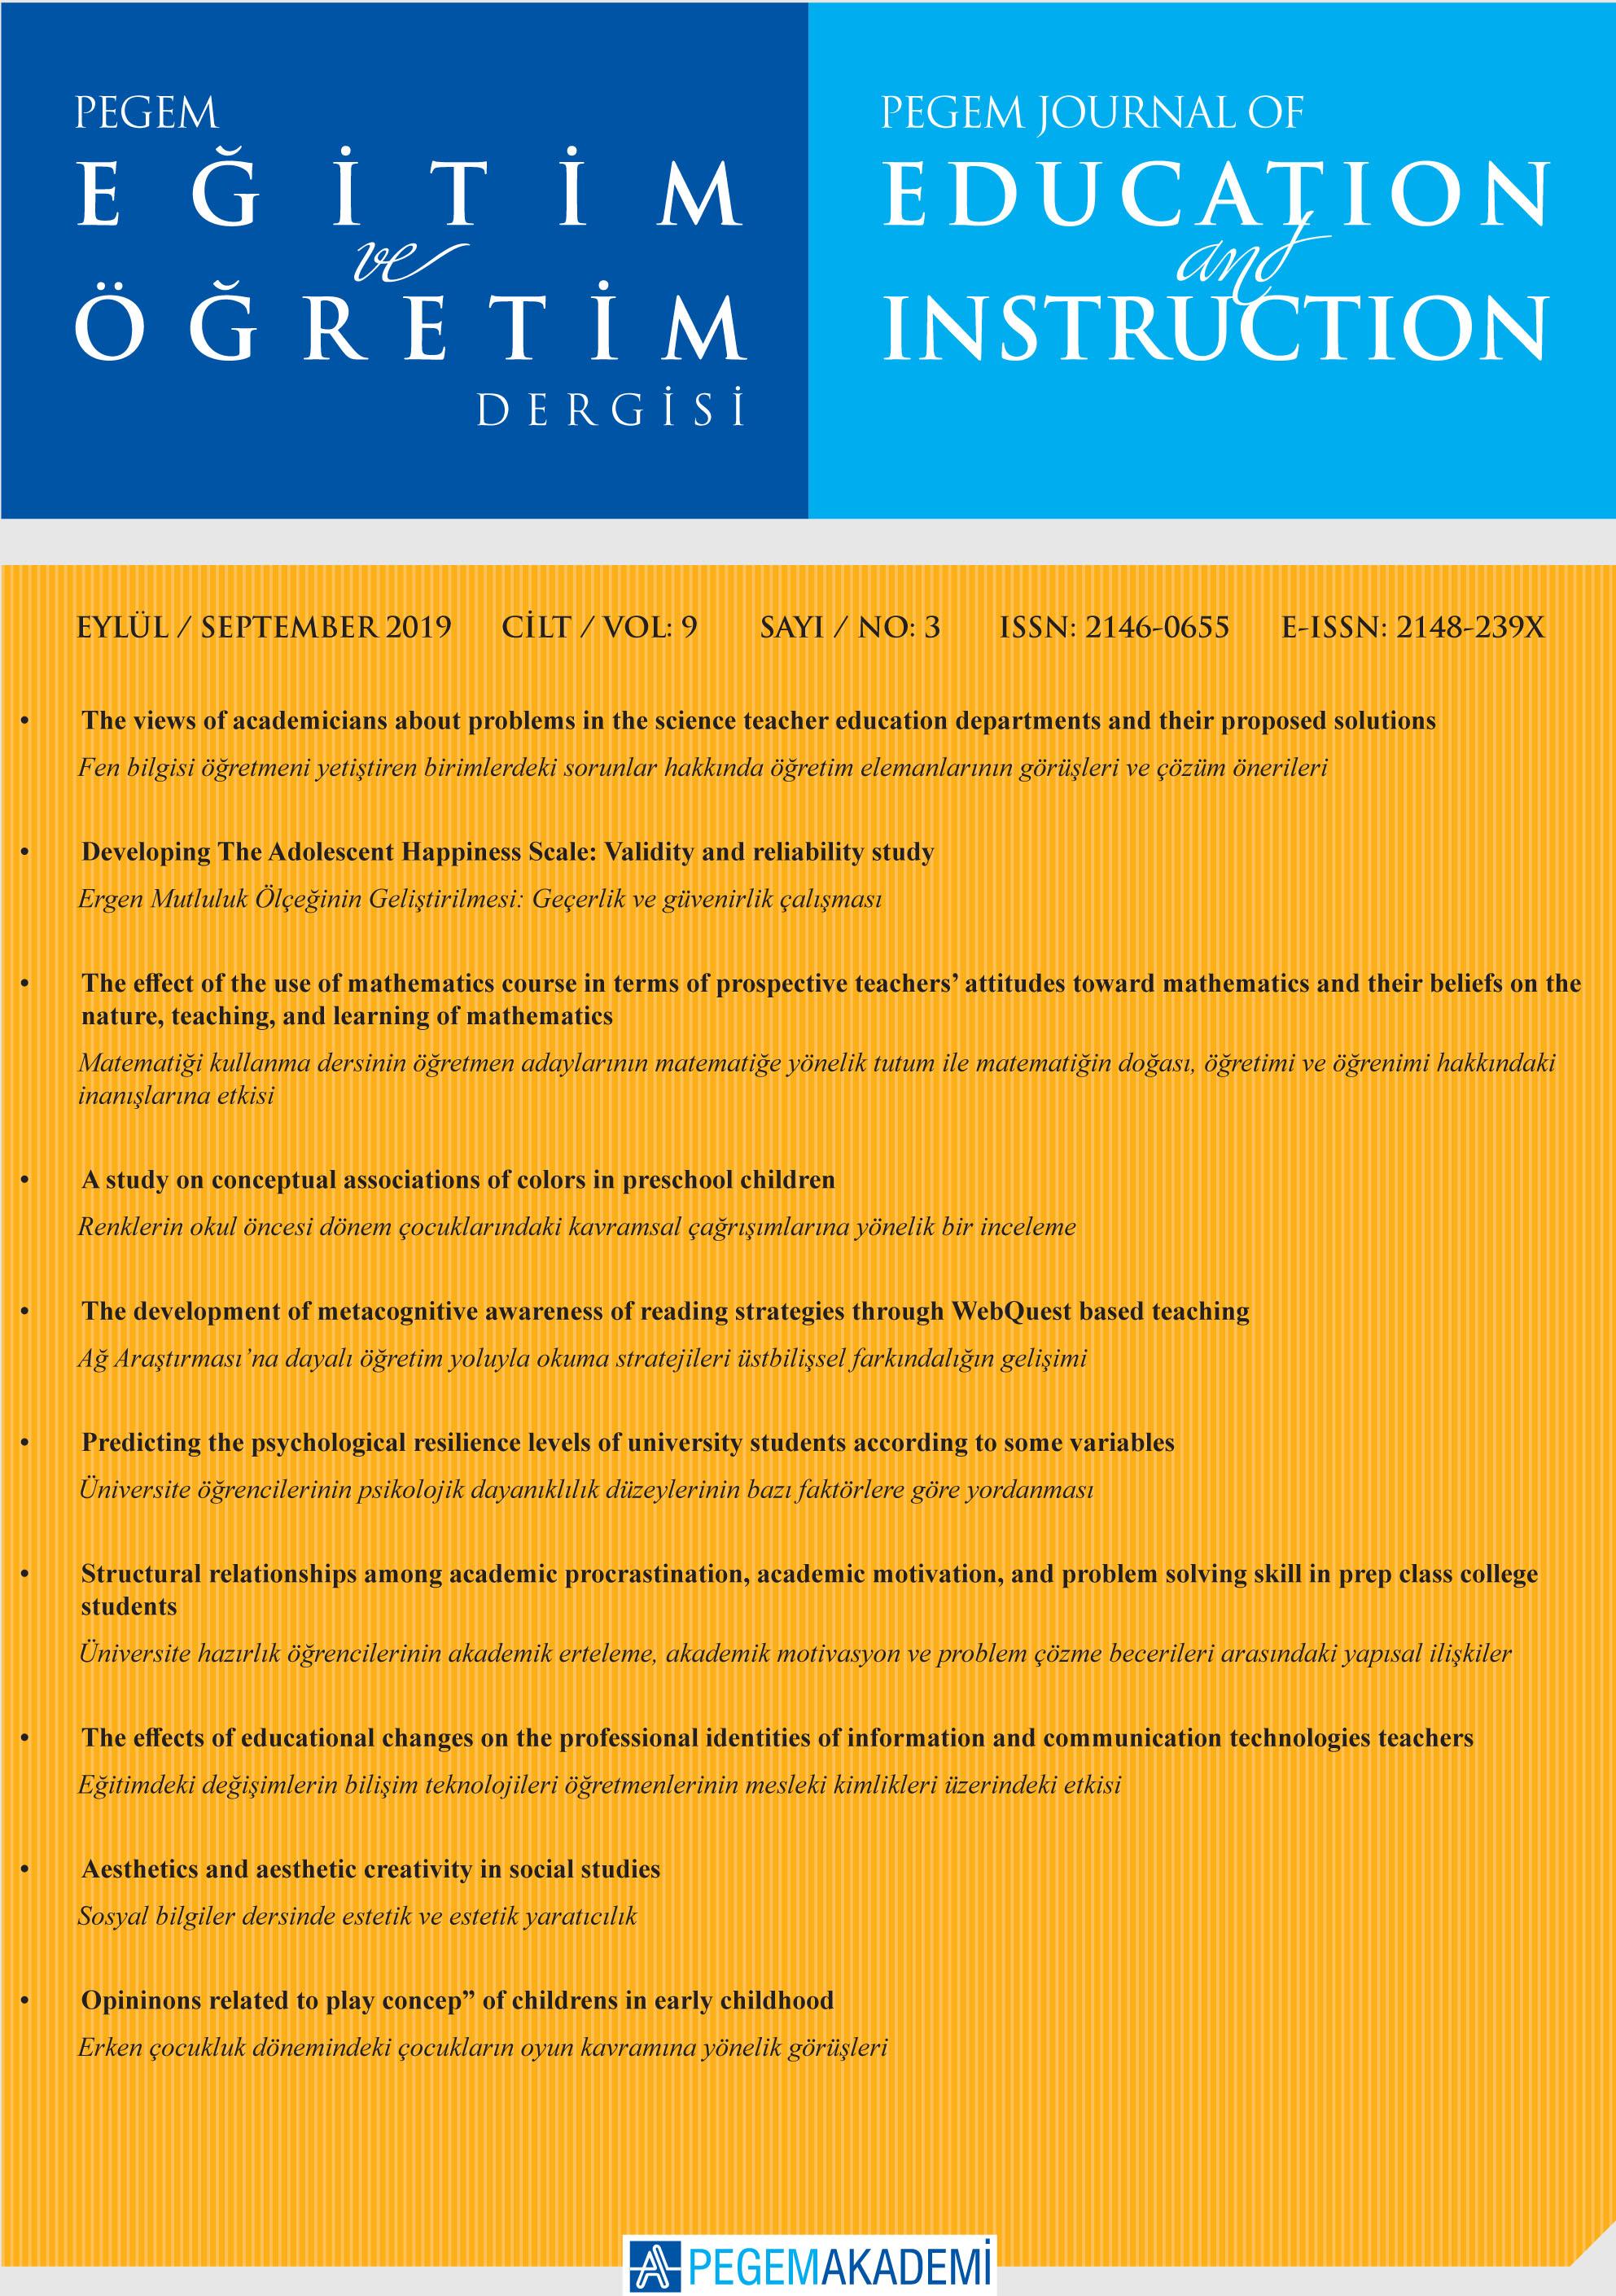 Structural relationships among academic procrastination